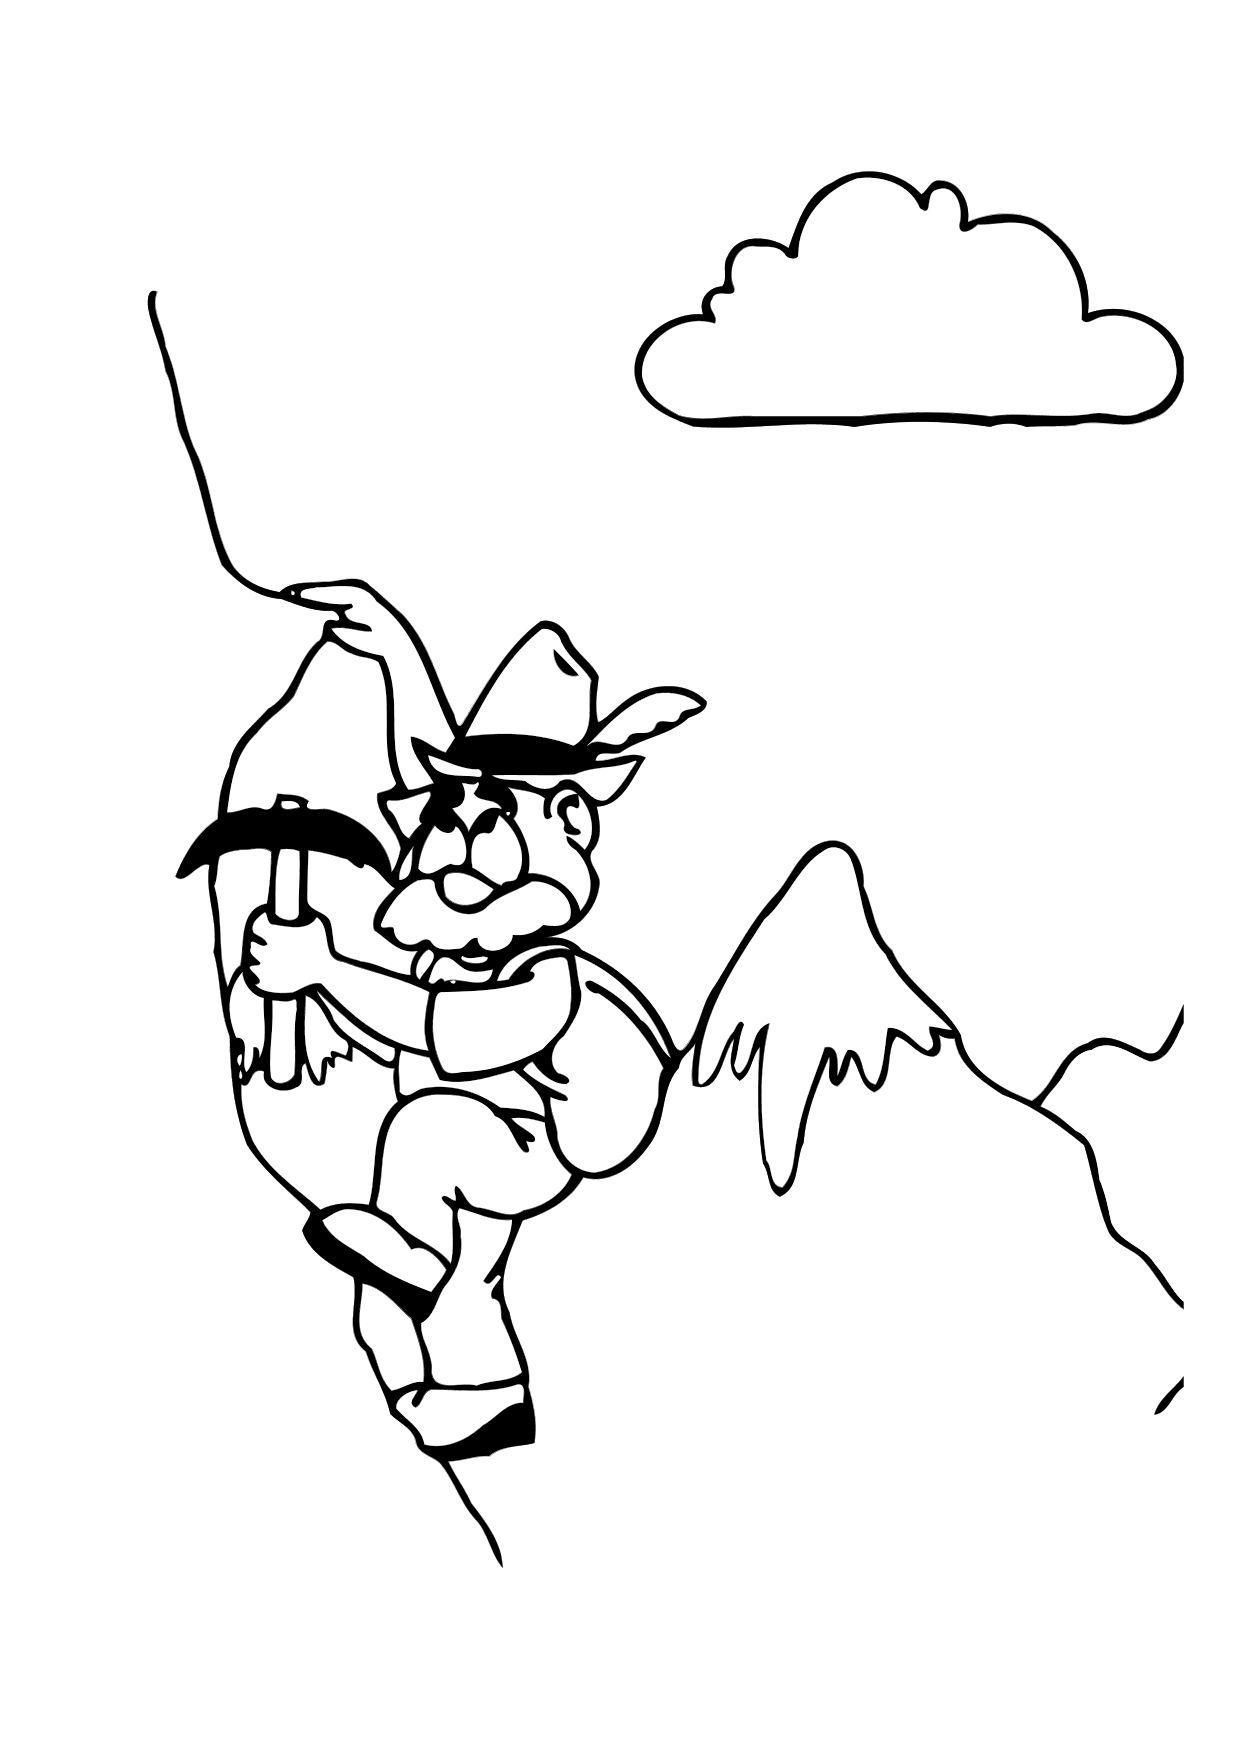 Malvorlage Alpinist | Ausmalbild 12166.